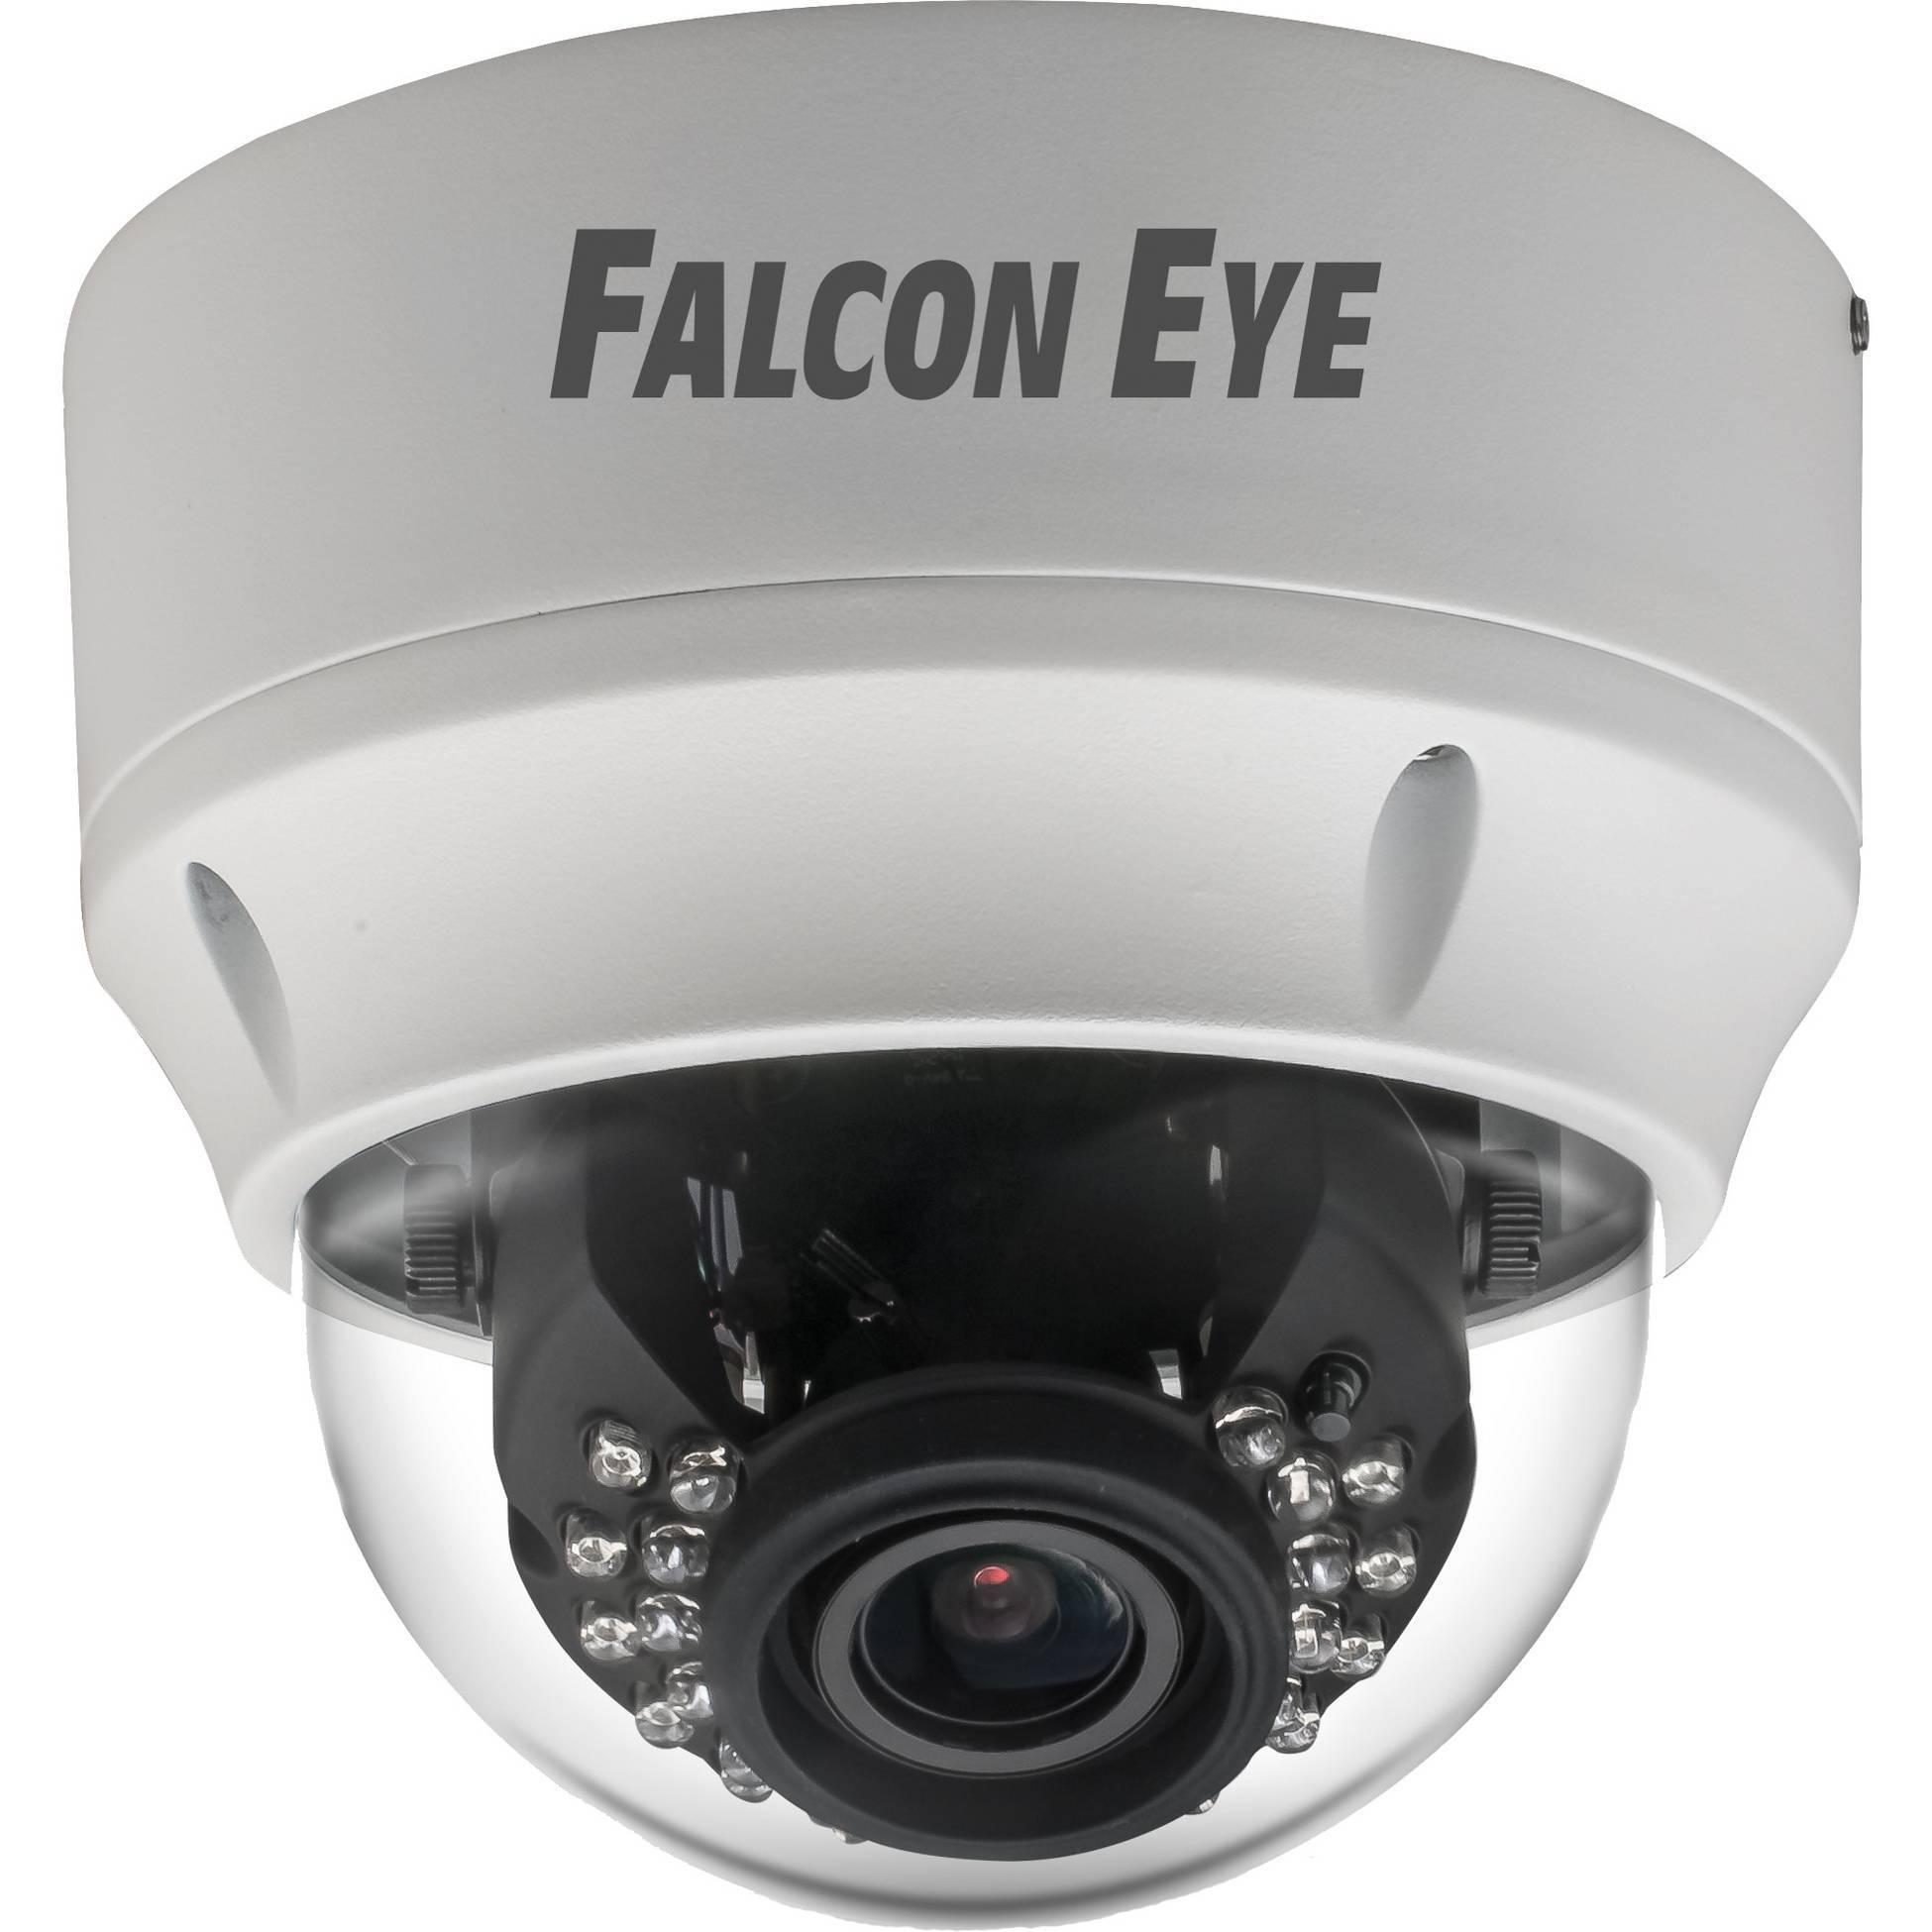 IP-камера купольная FALCON EYE FE-IPC-DL301PVA